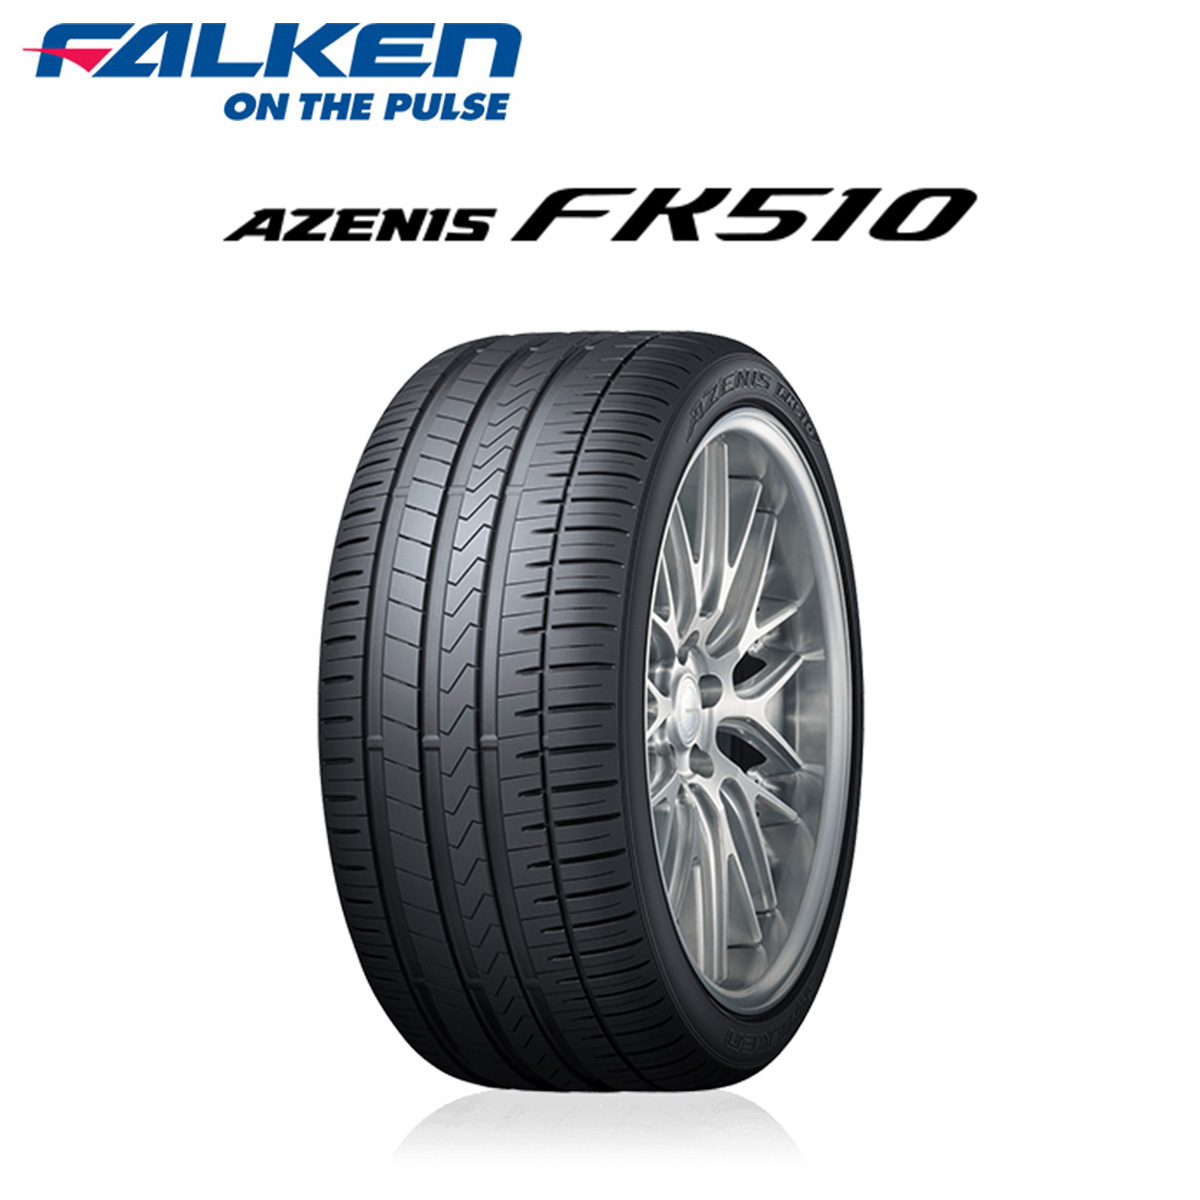 FALKEN ファルケン プレミアム フラッグシップ 4WD 4X4 4駆 タイヤ 1本 18インチ 235/55R18 AZENIS FK510 SUV アゼニス